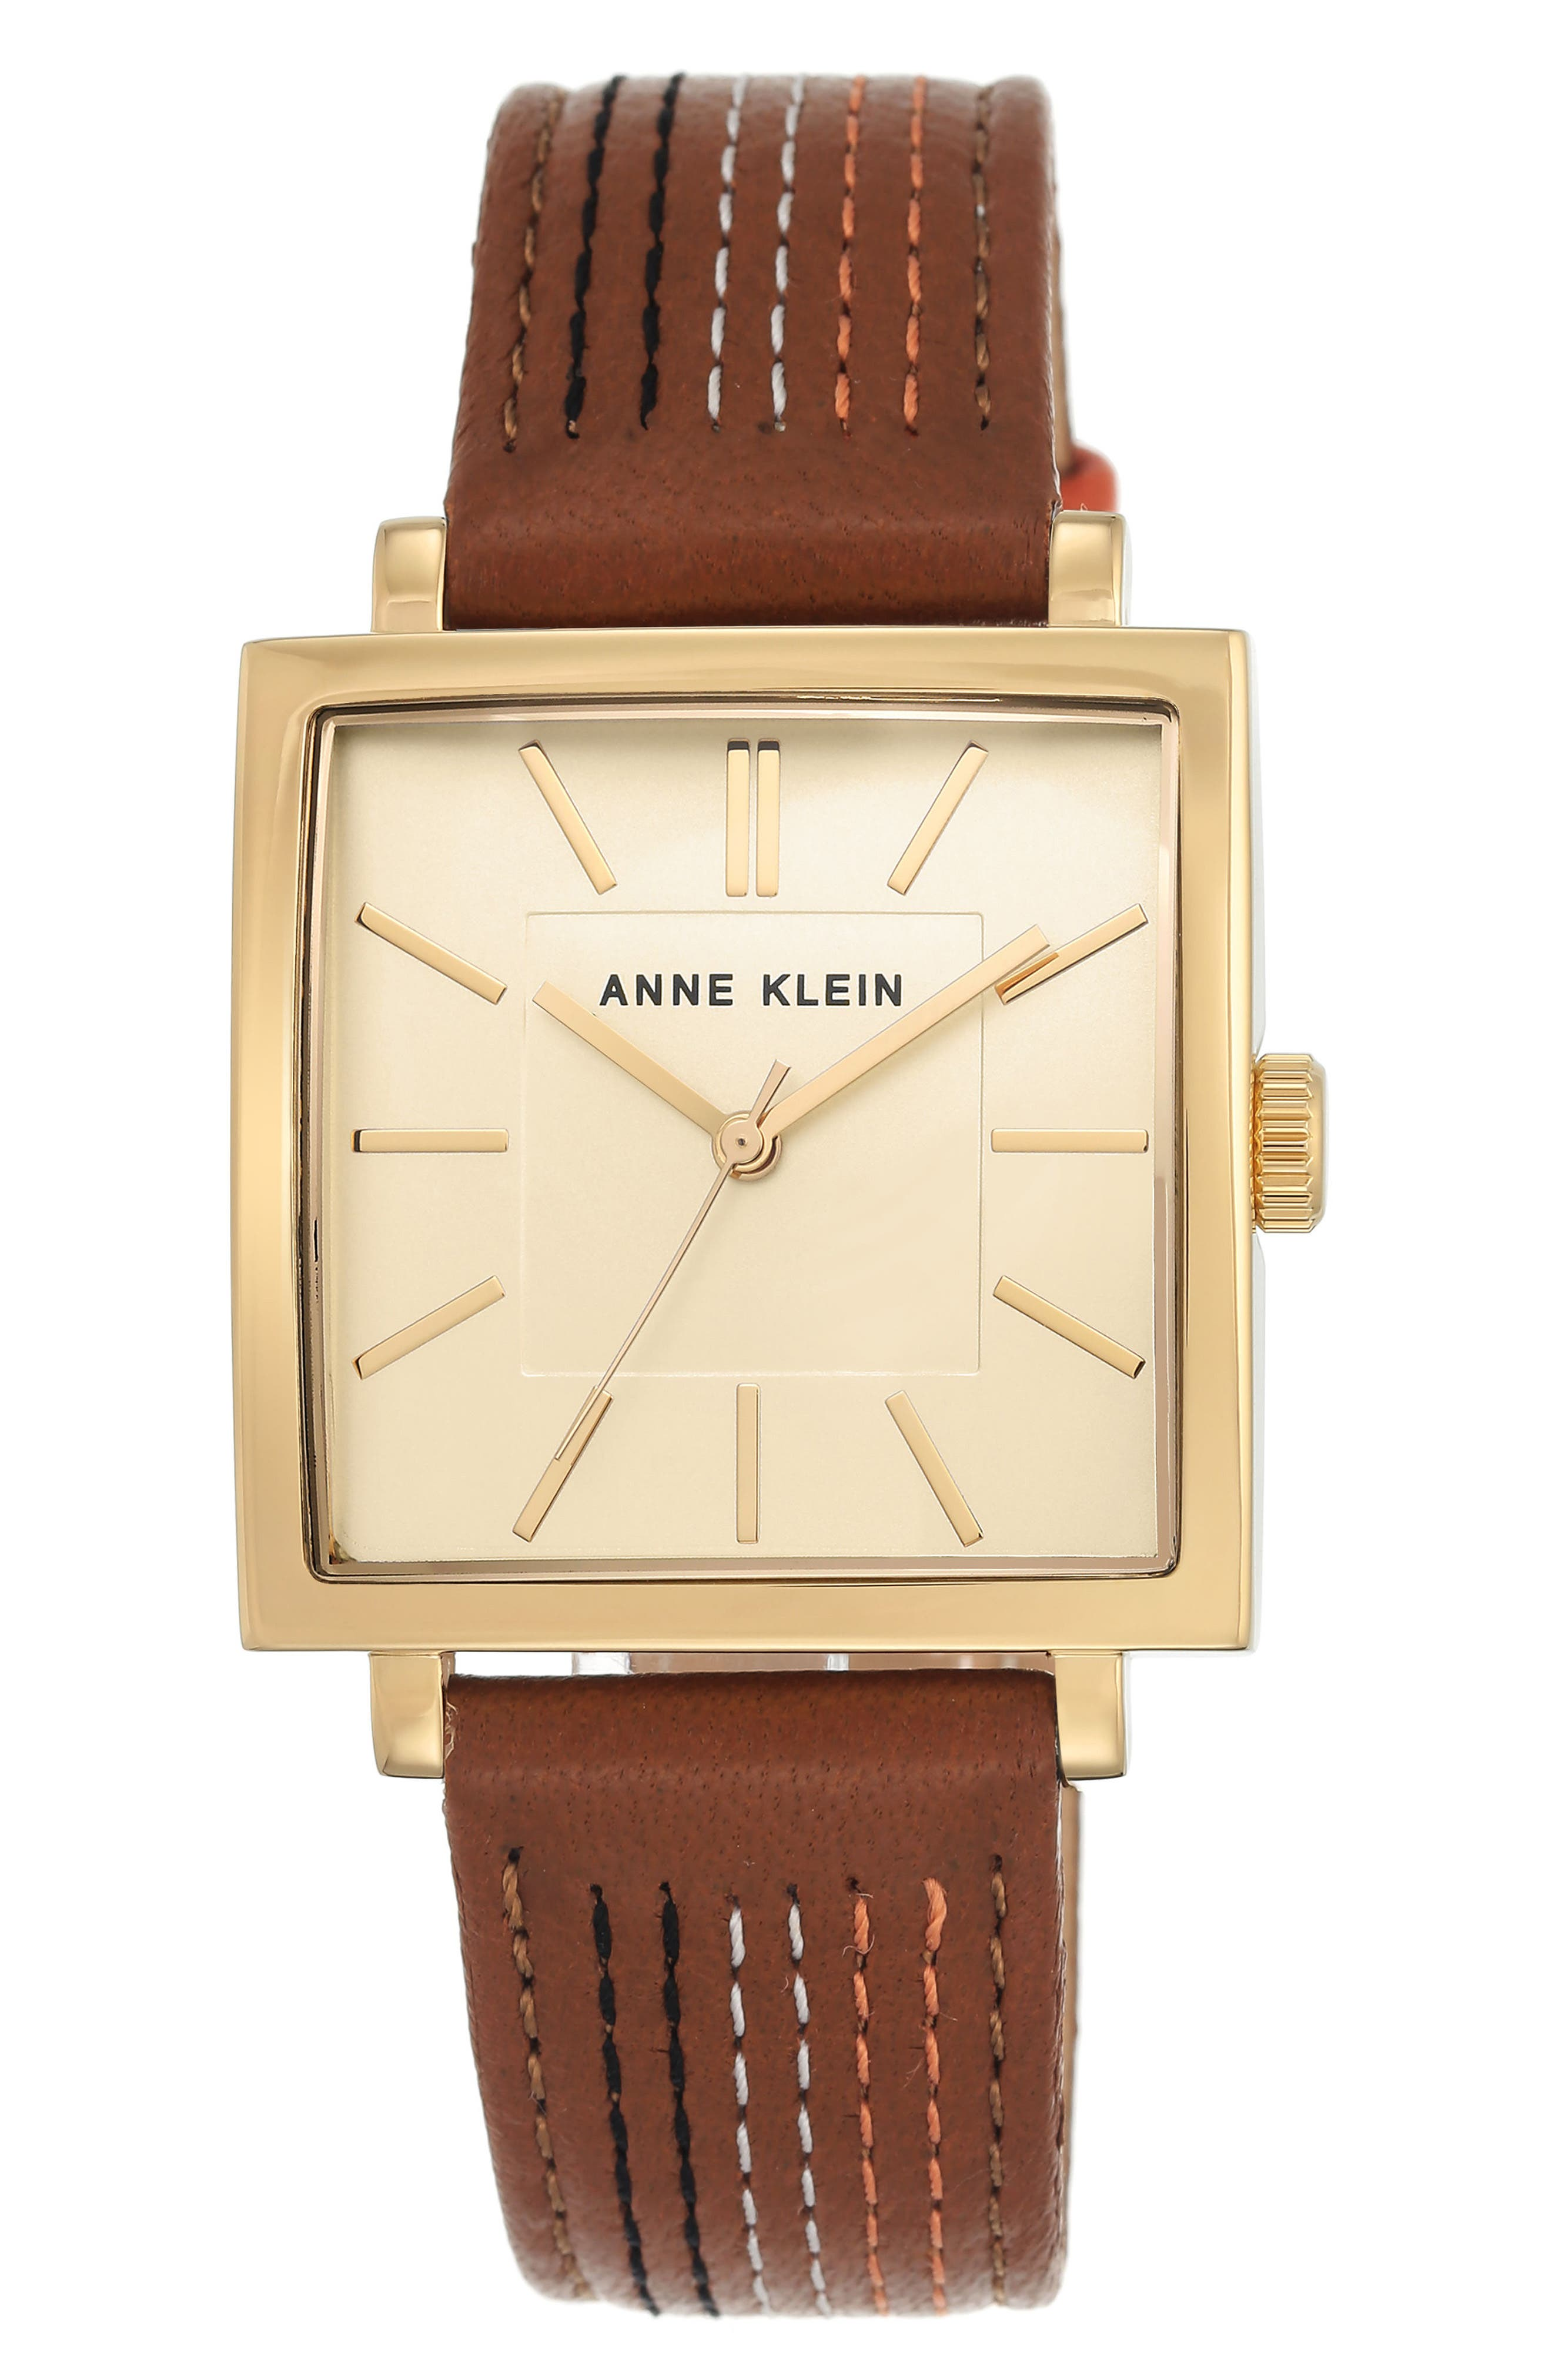 Anne Klein Square Leather Strap Watch, 42mm x 34mm